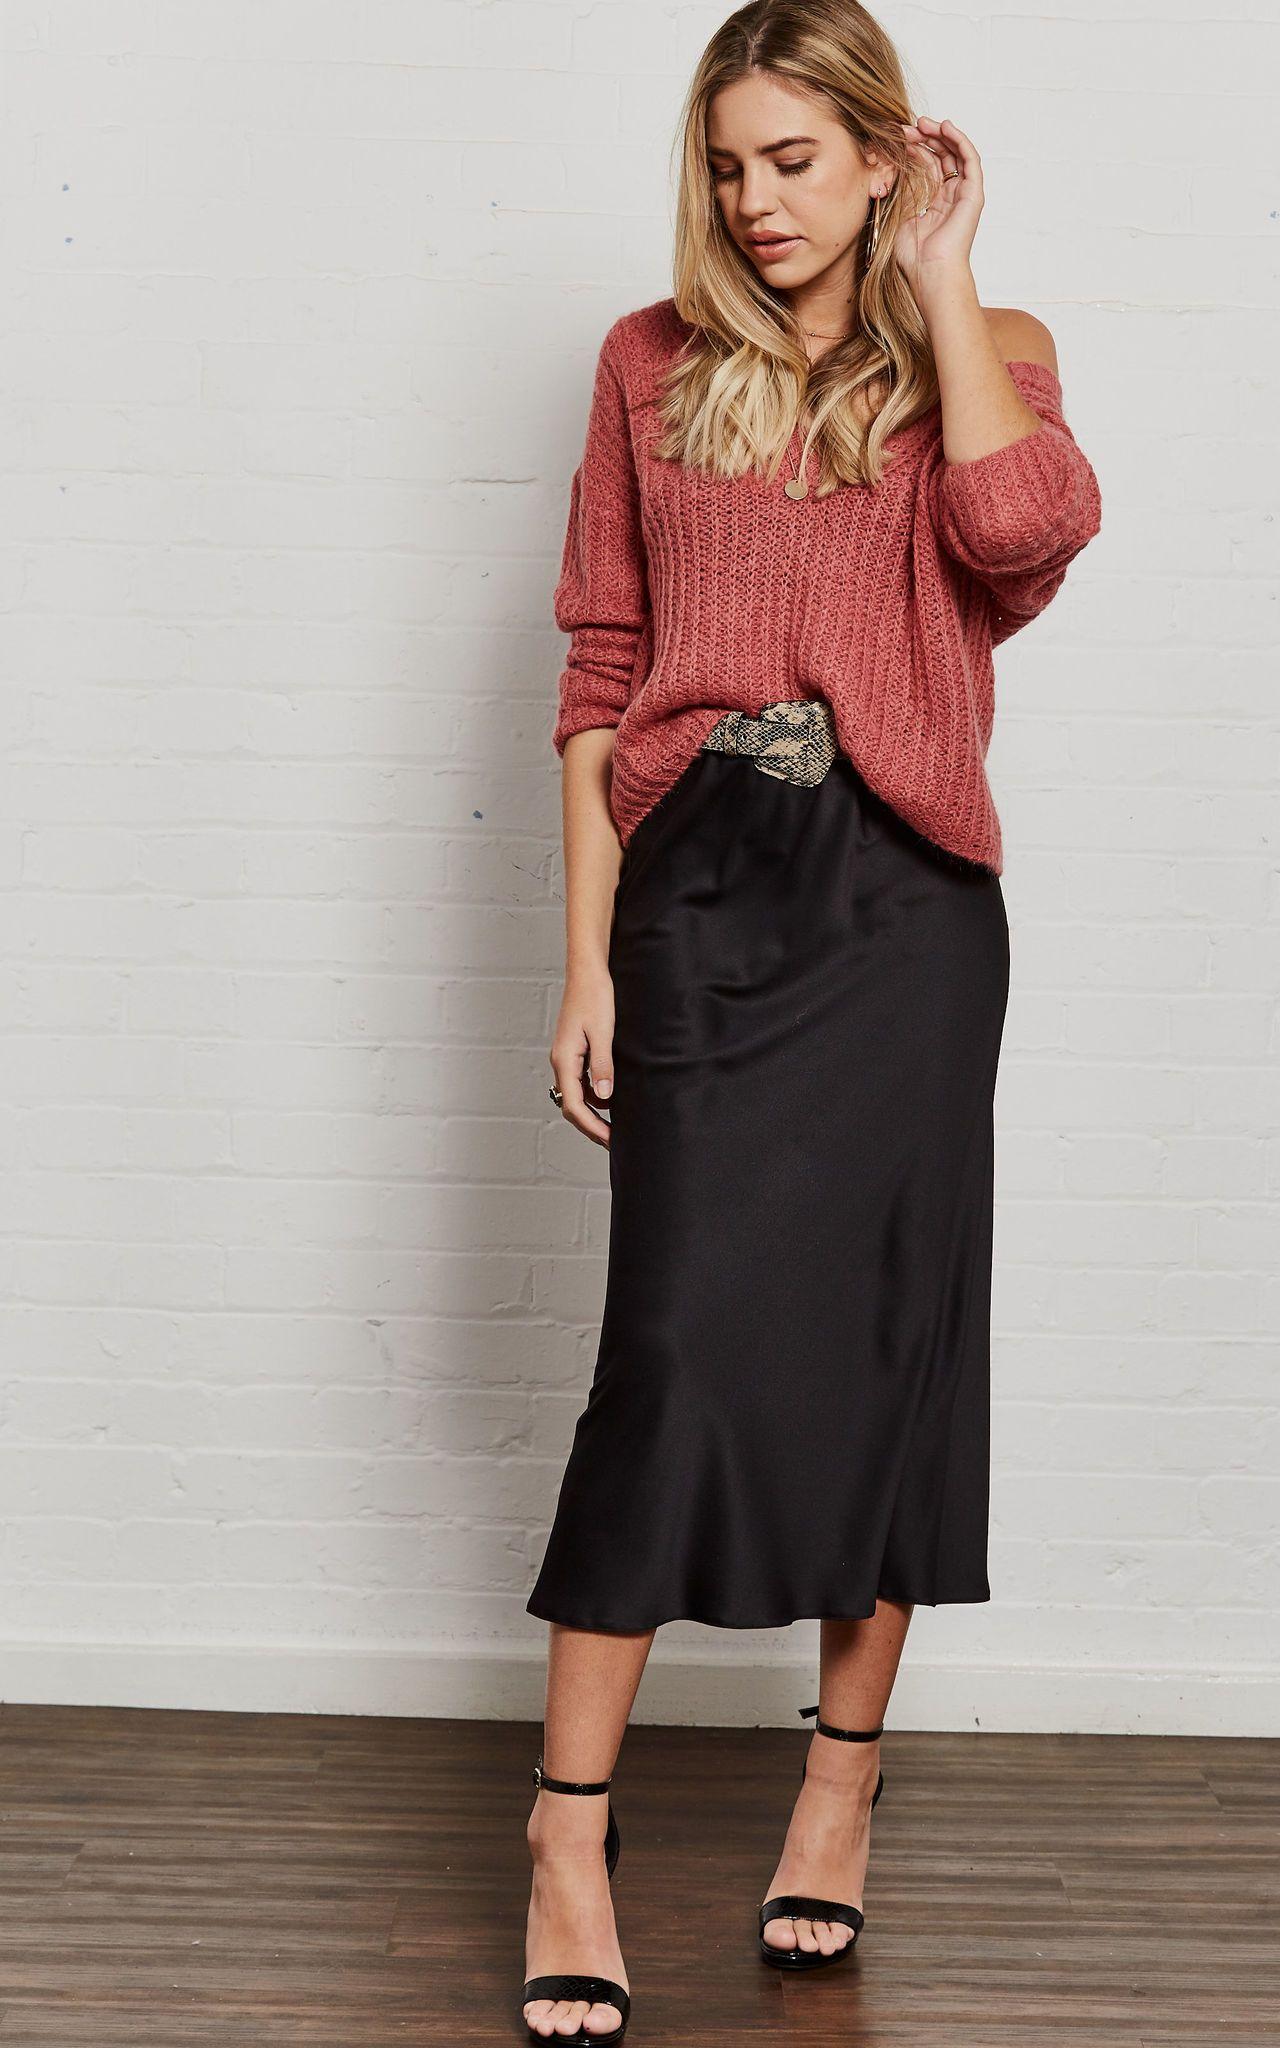 c3b9a67eafb Silk Slip Skirt midi black Silk outfit Silky style ideas street style  fashion fall trends look beliano